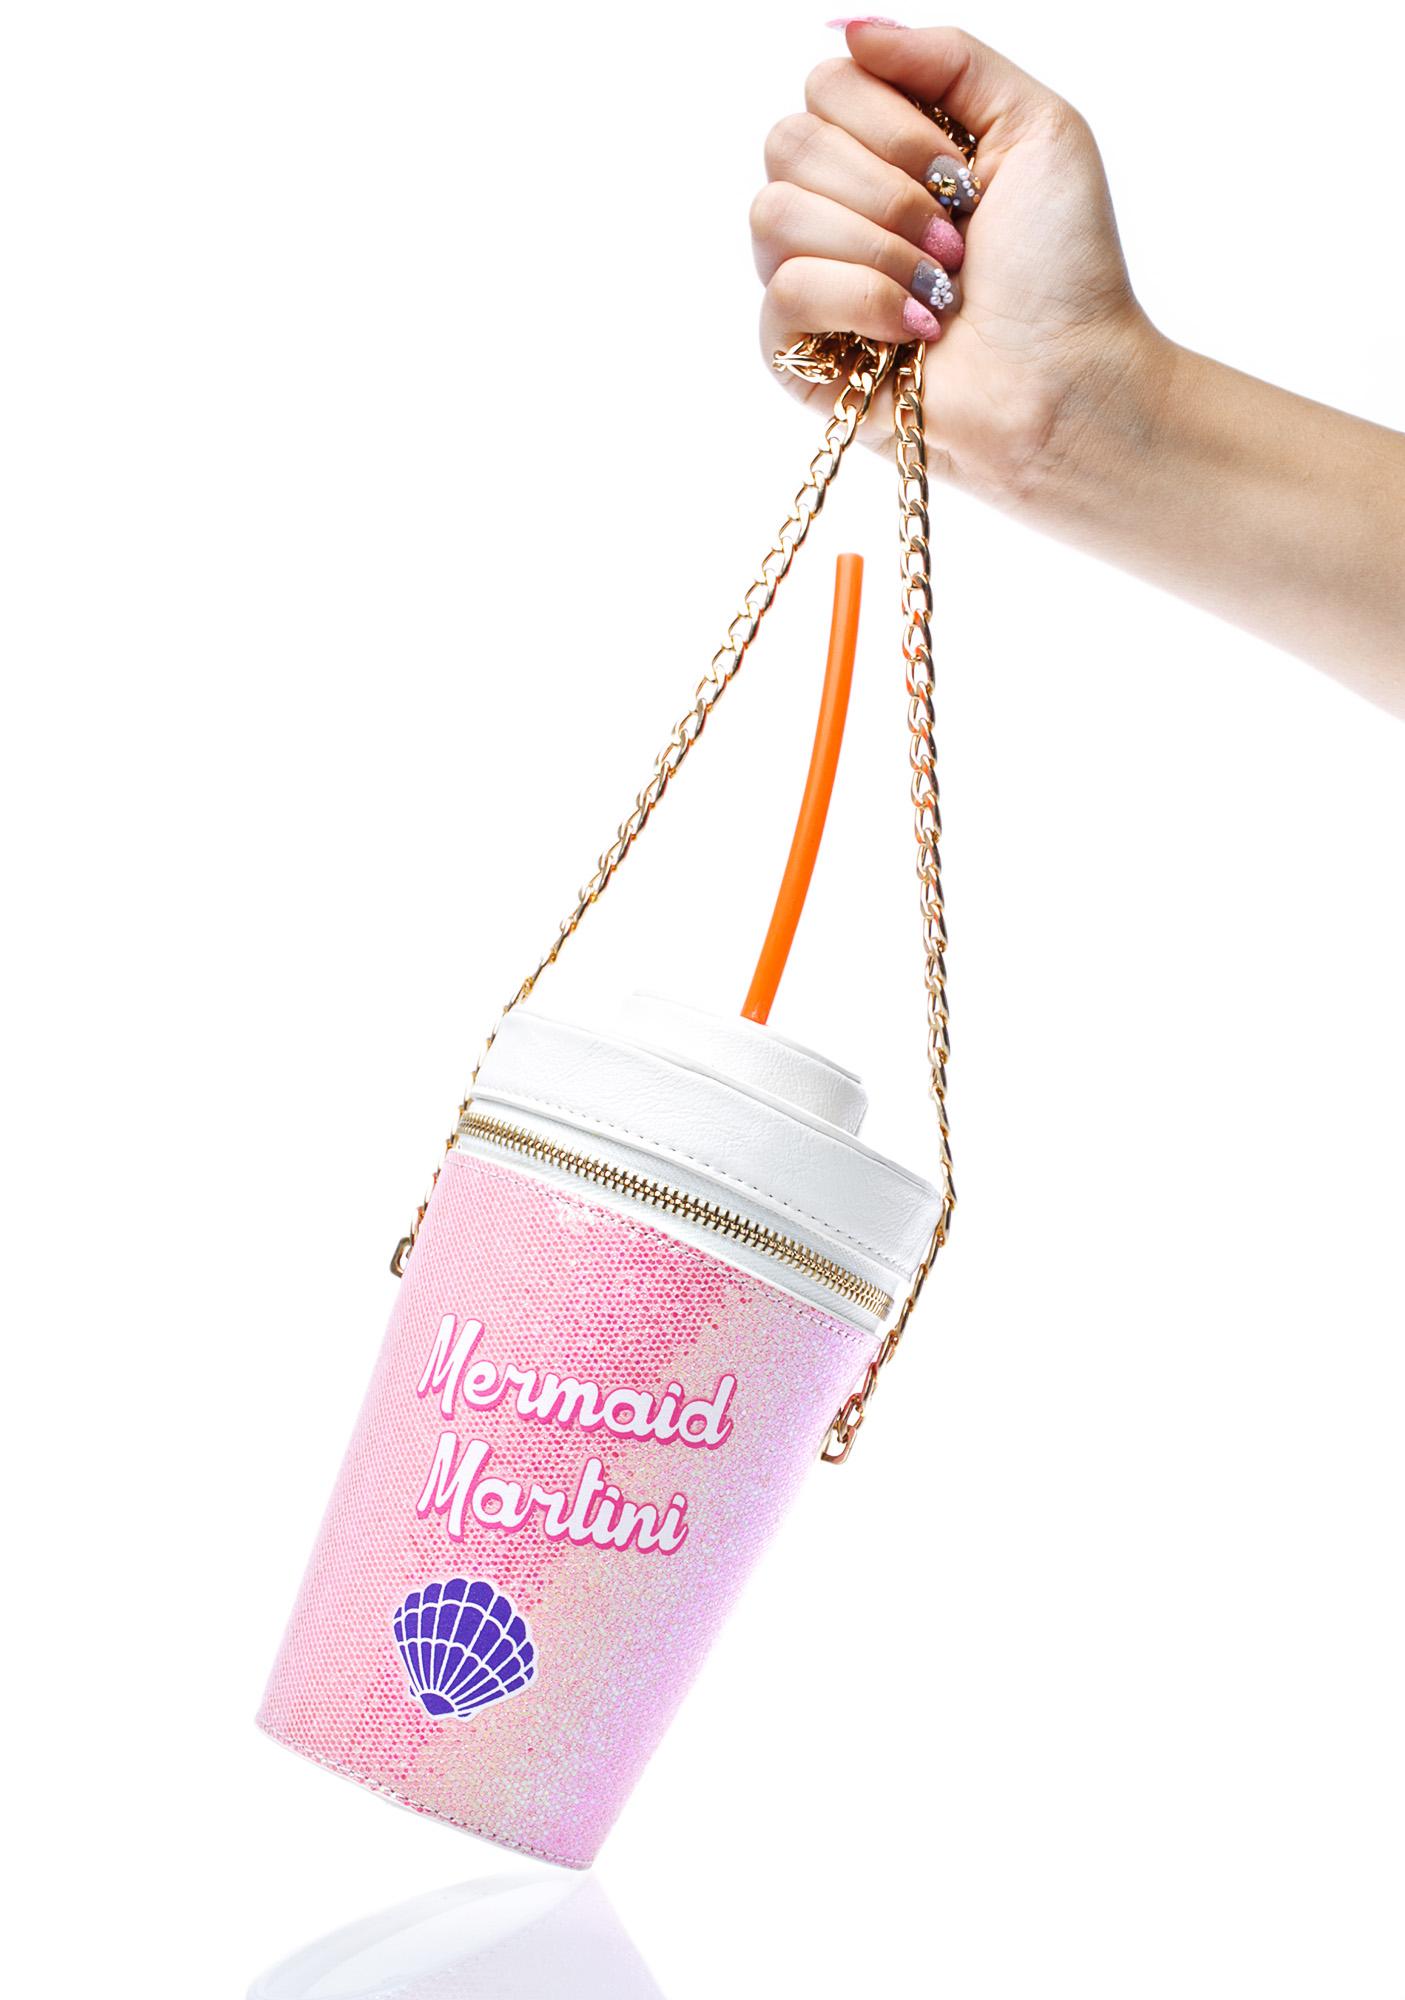 Skinnydip Mermaid Martini Cross Body Bag